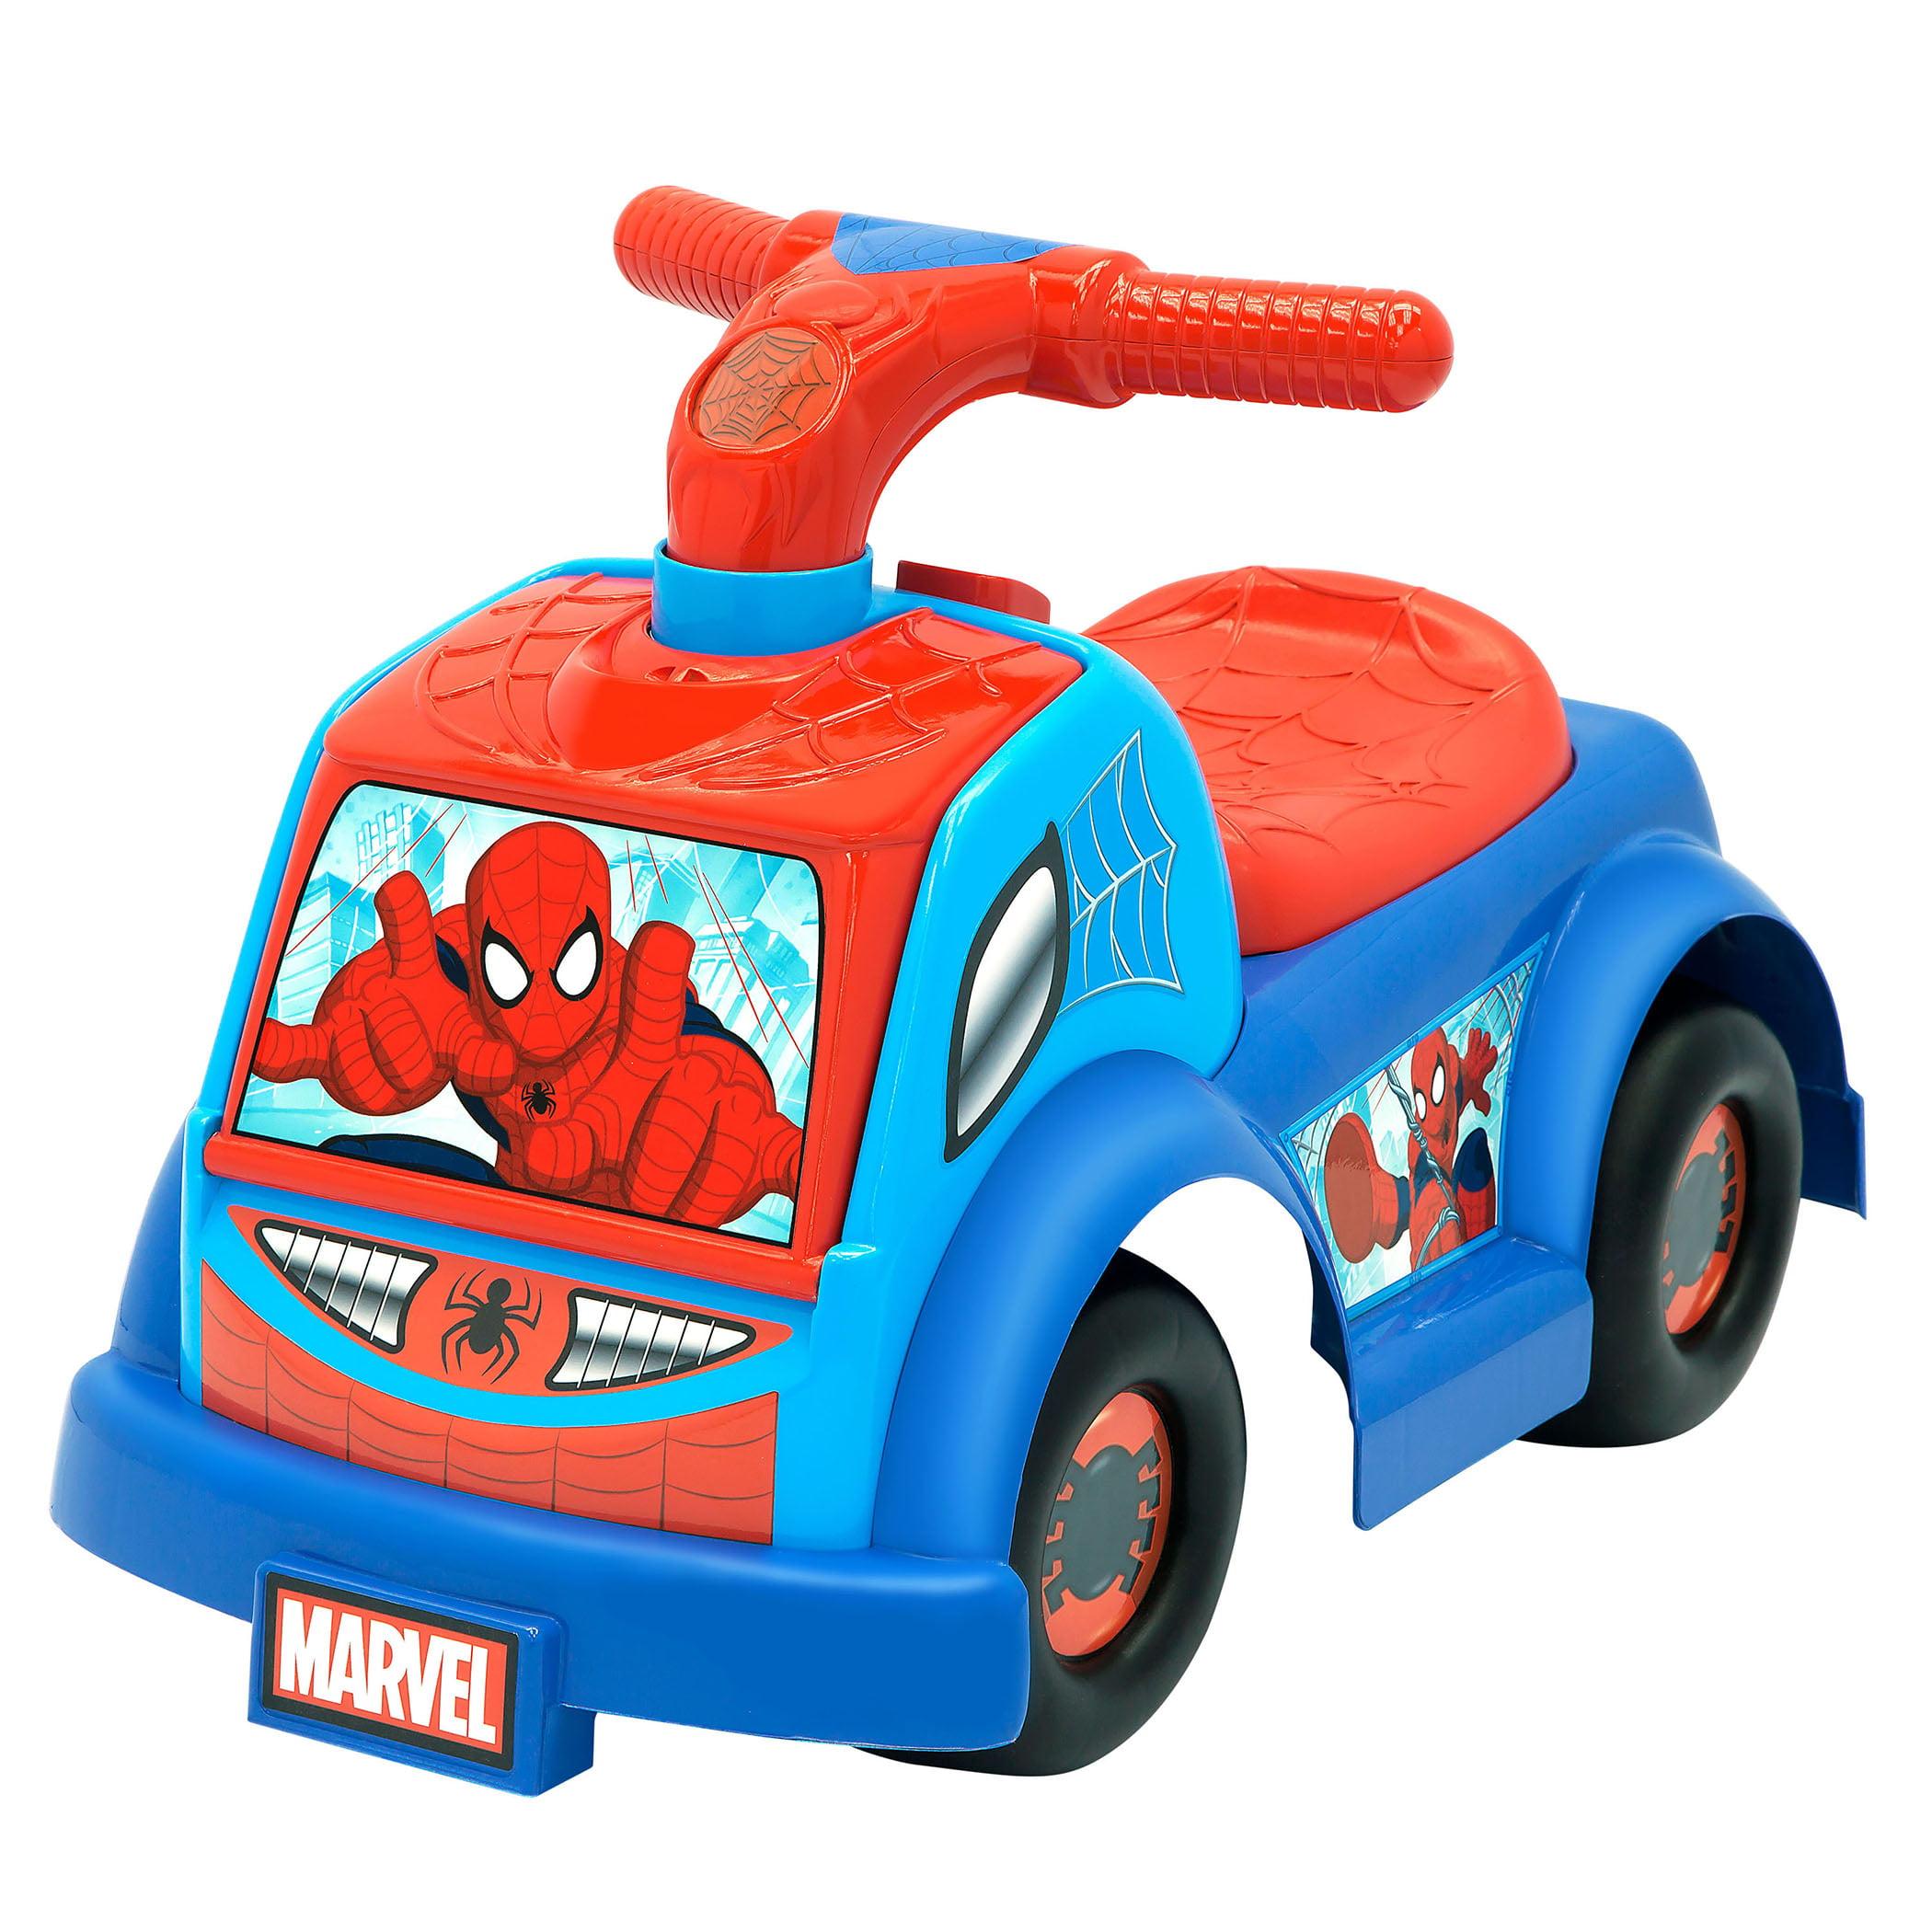 Marvel Spiderman Adventures Web-Slinger Preschool Ride-On